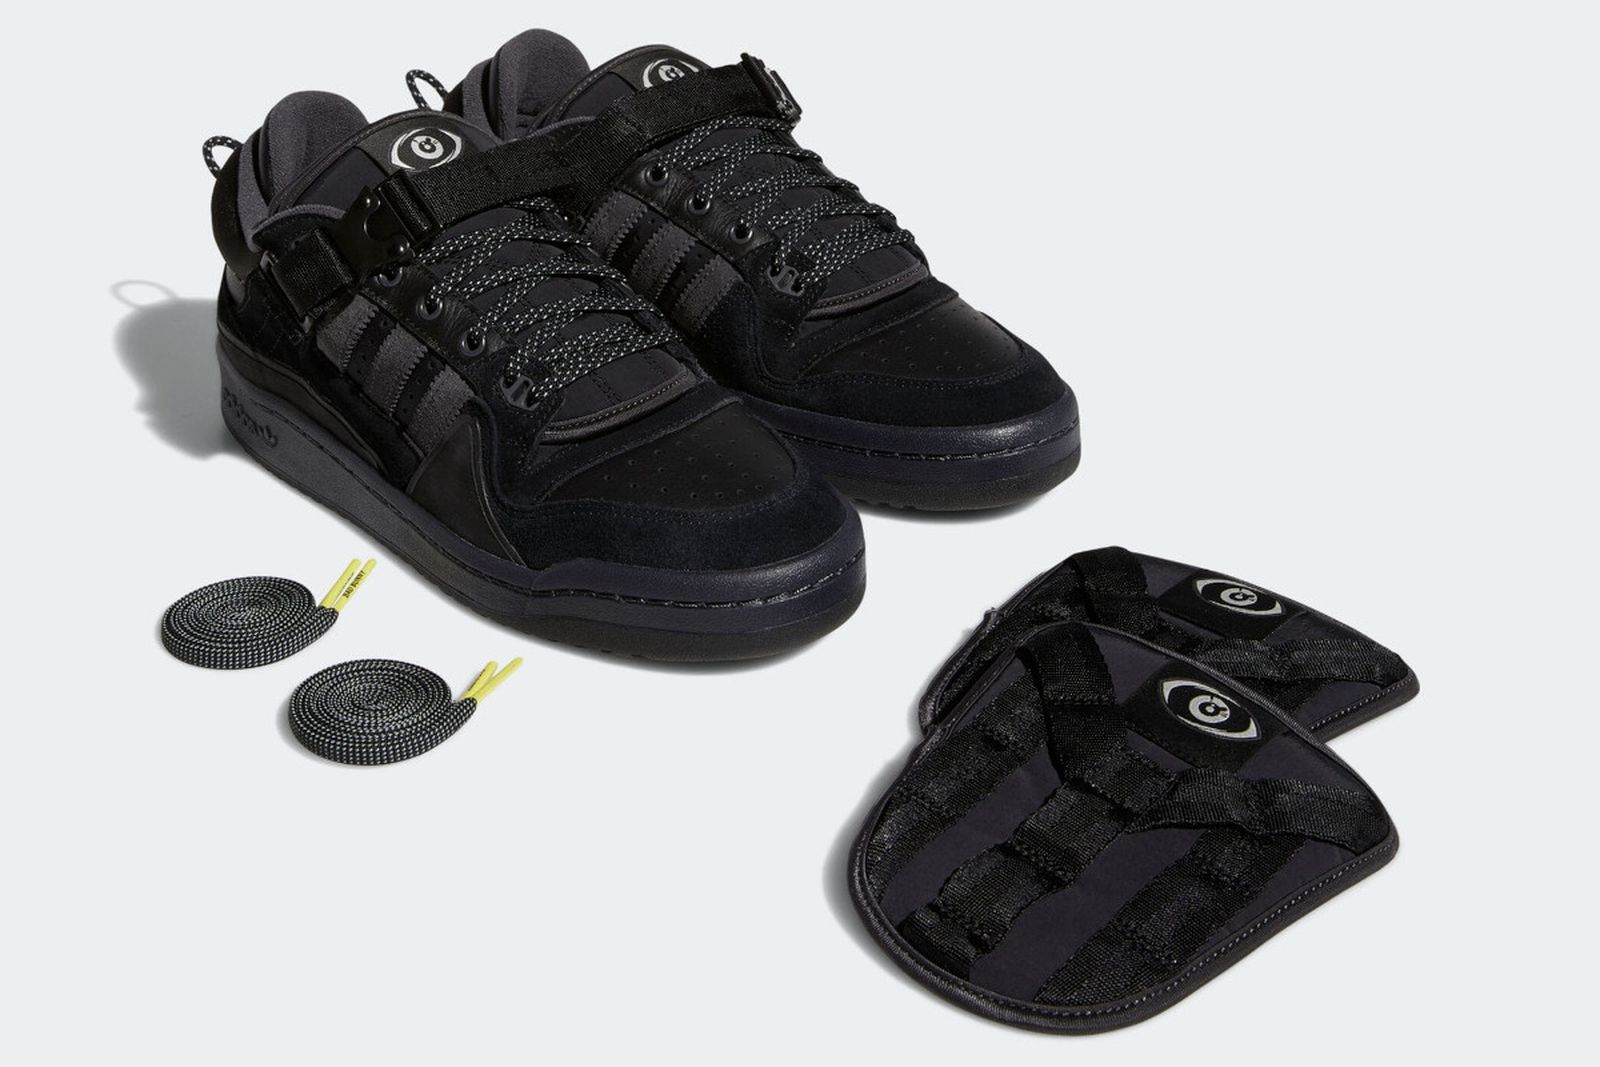 bad-bunny-adidas-originals-forum-low-triple-black-release-date-price-03